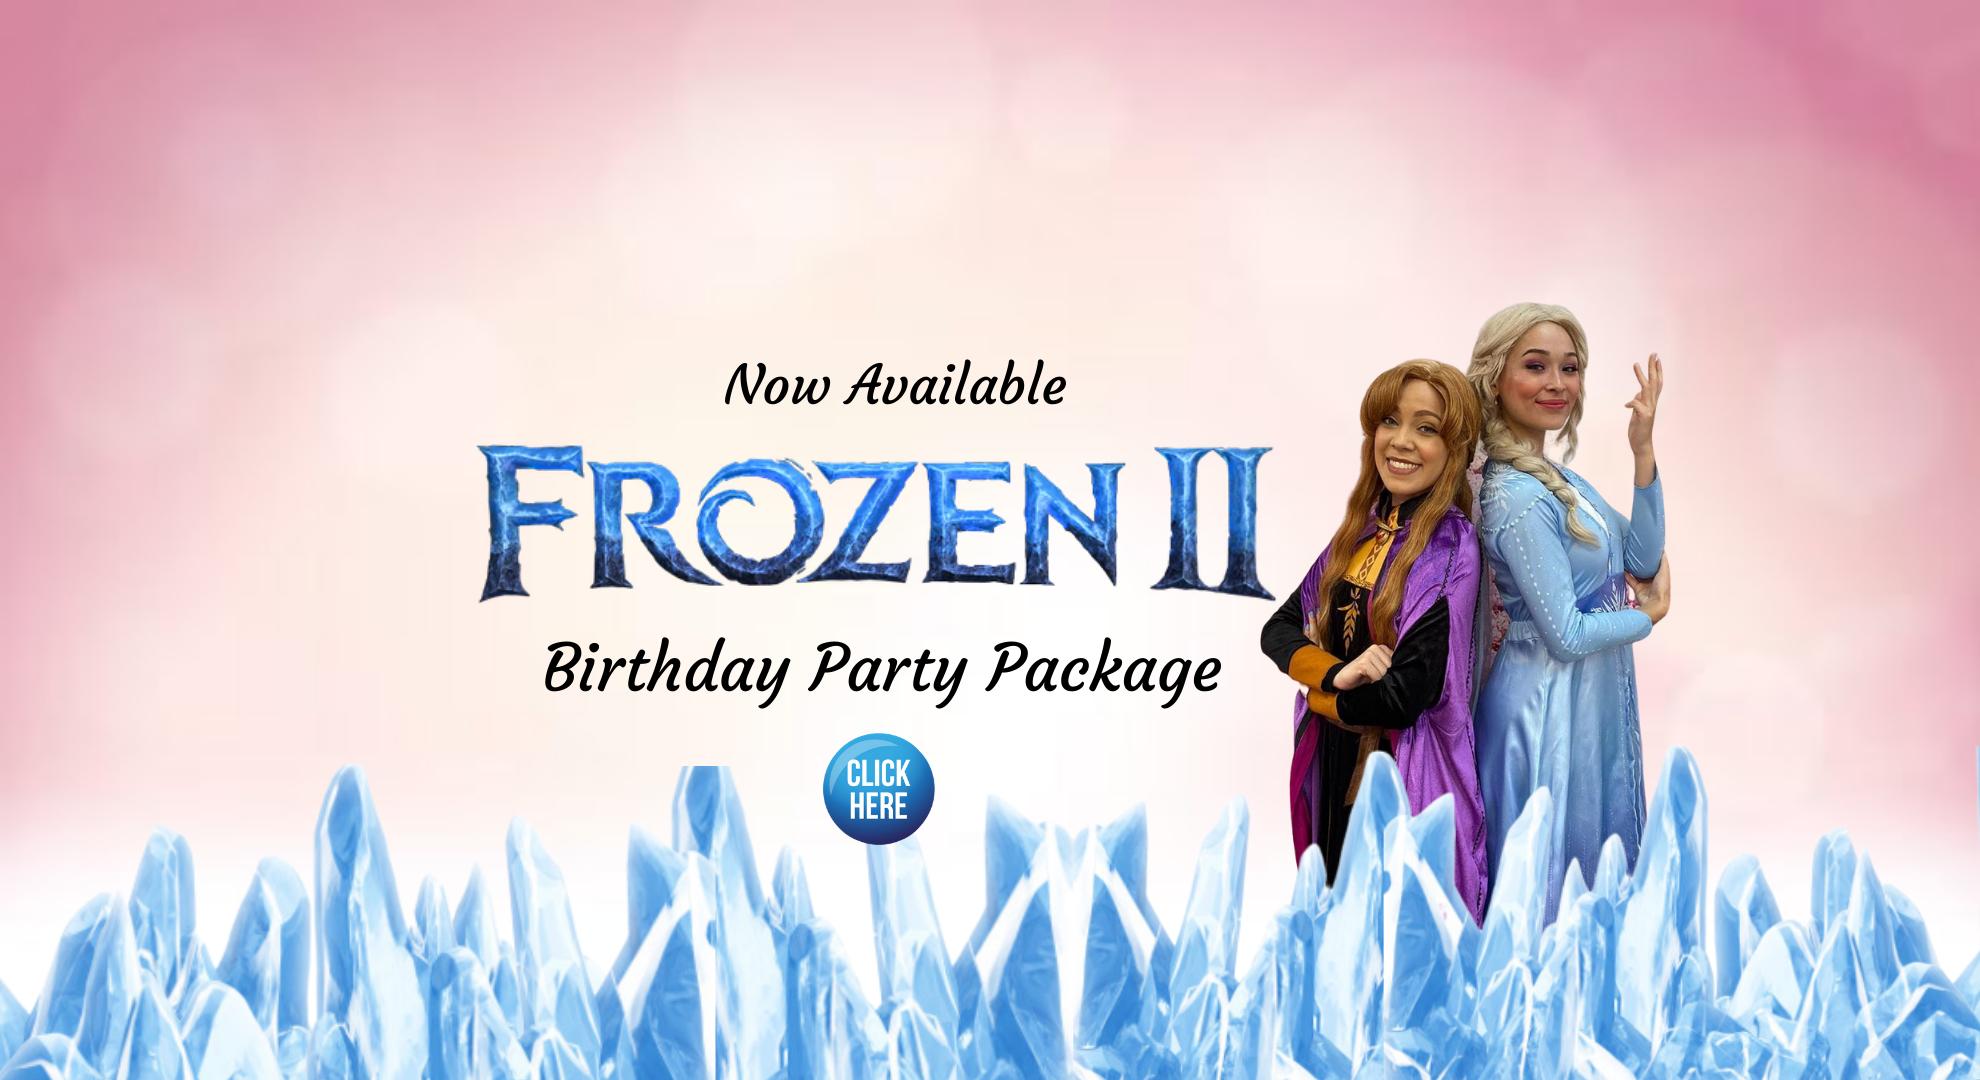 Little Princess Spa Frozen 2 party package